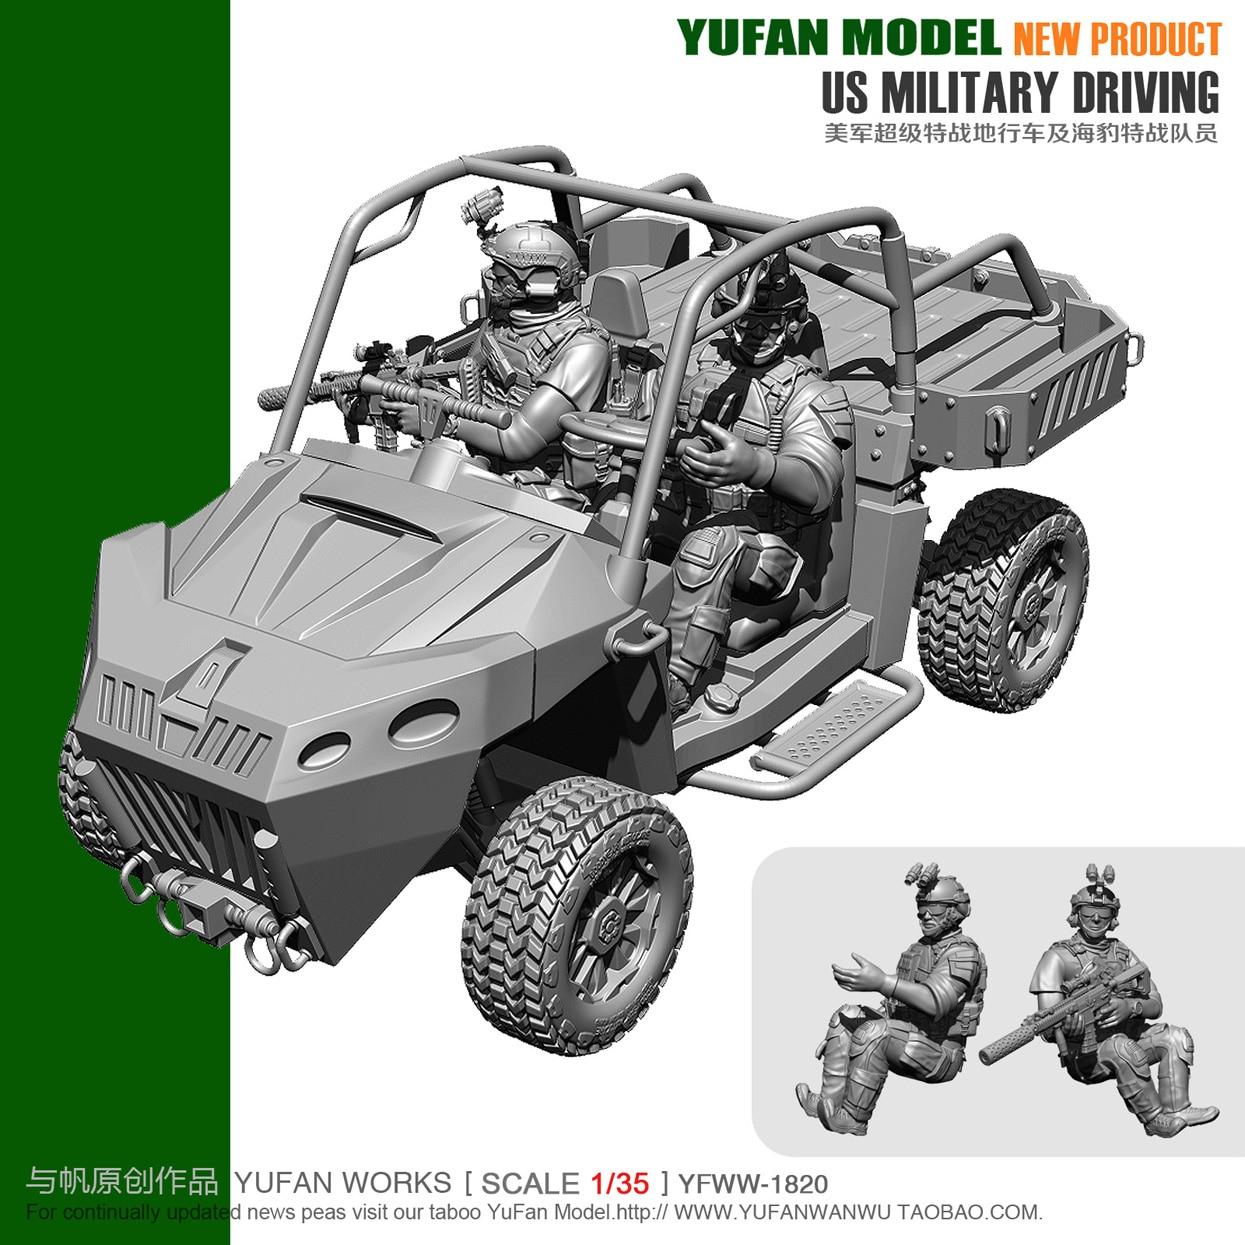 1/35 US Terrain Vehicle and Driver Yfww 35 - 18201/35 US Terrain Vehicle and Driver Yfww 35 - 1820